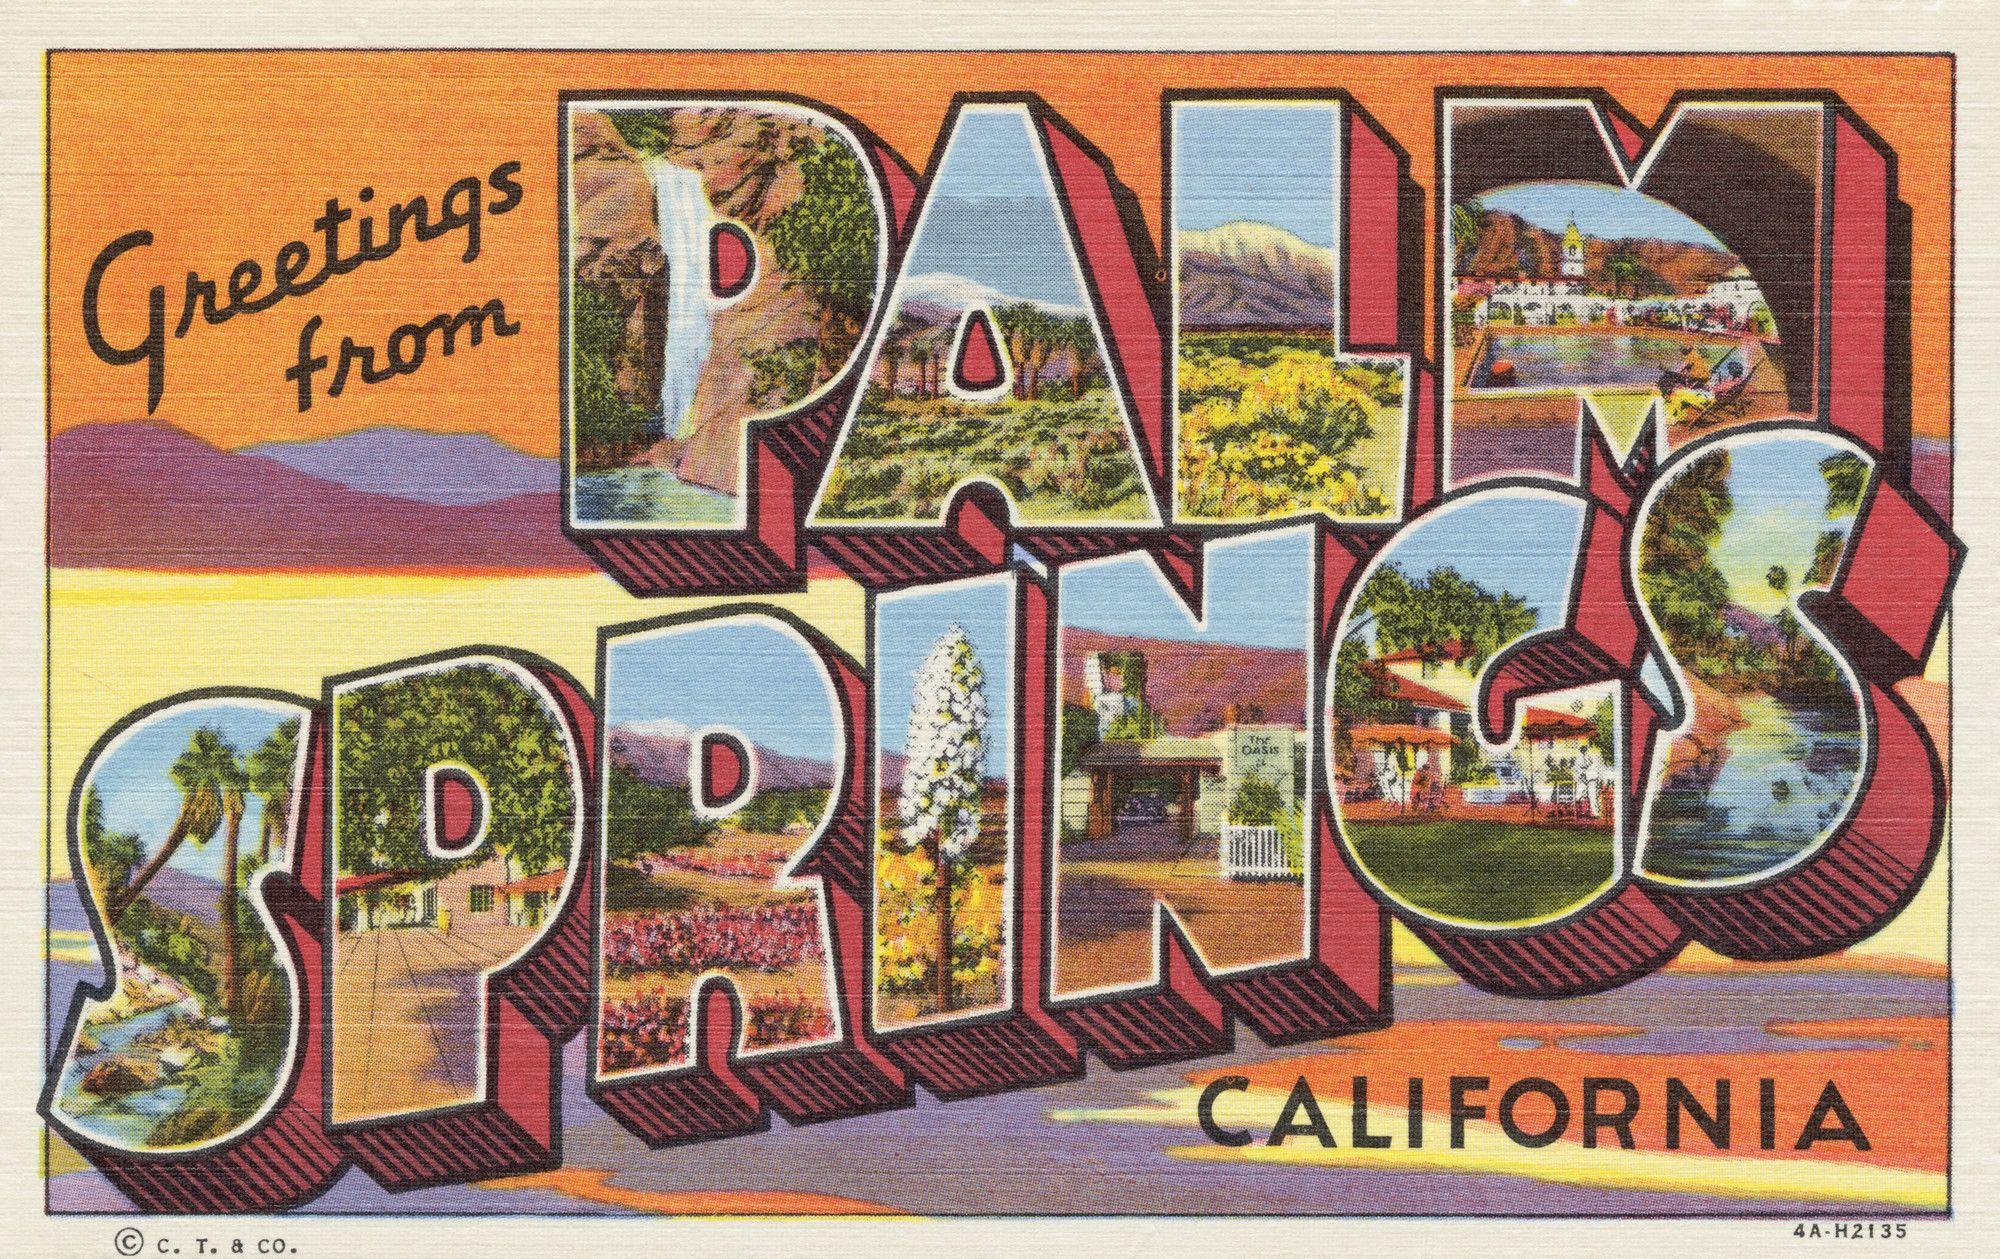 Greetings from palm springs postcard pinterest palm springs greetings from palm springs postcard by stephen h willard m4hsunfo